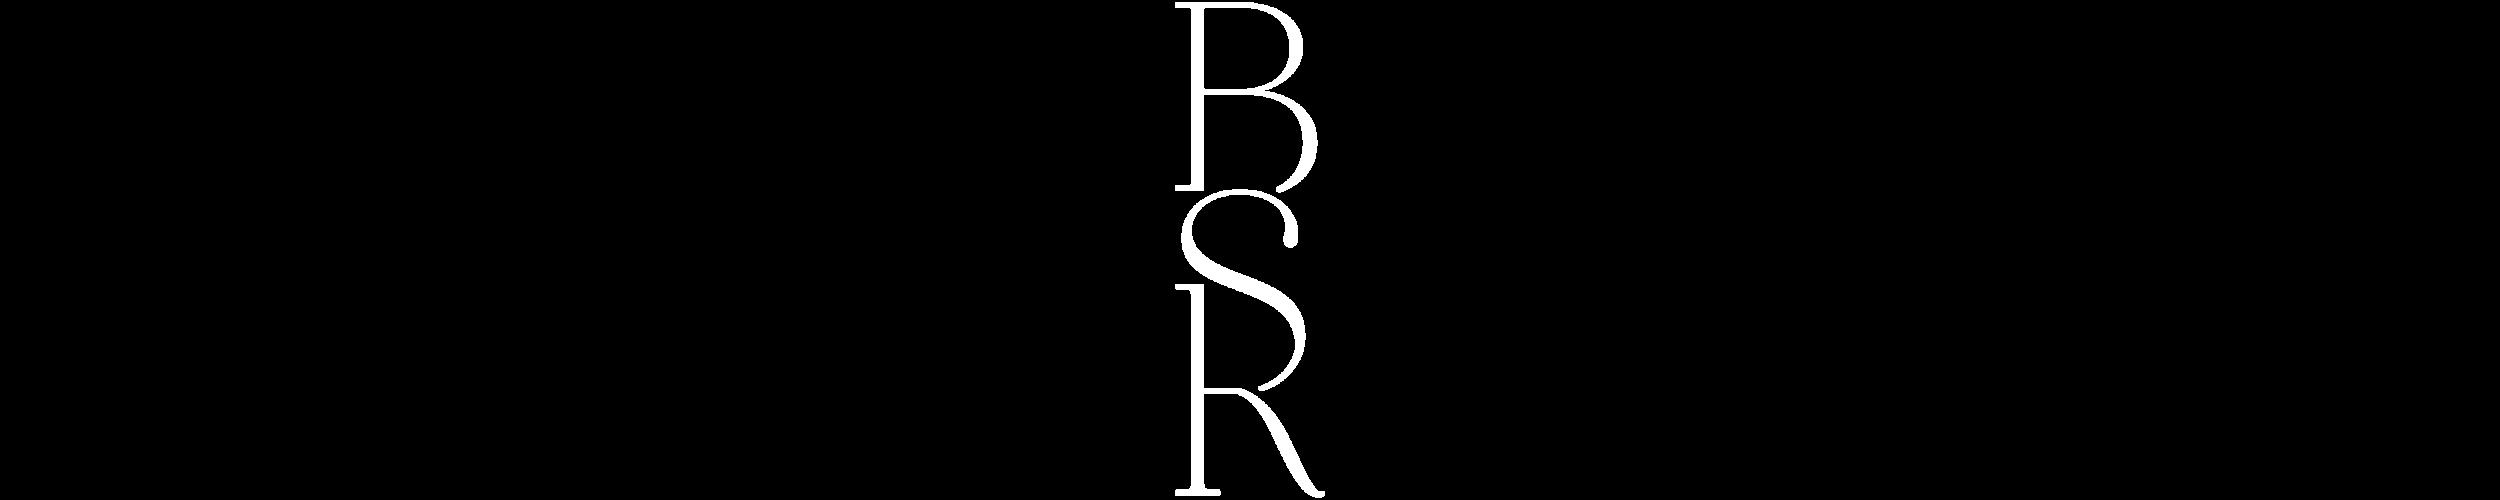 BSR-FooterLogo.png